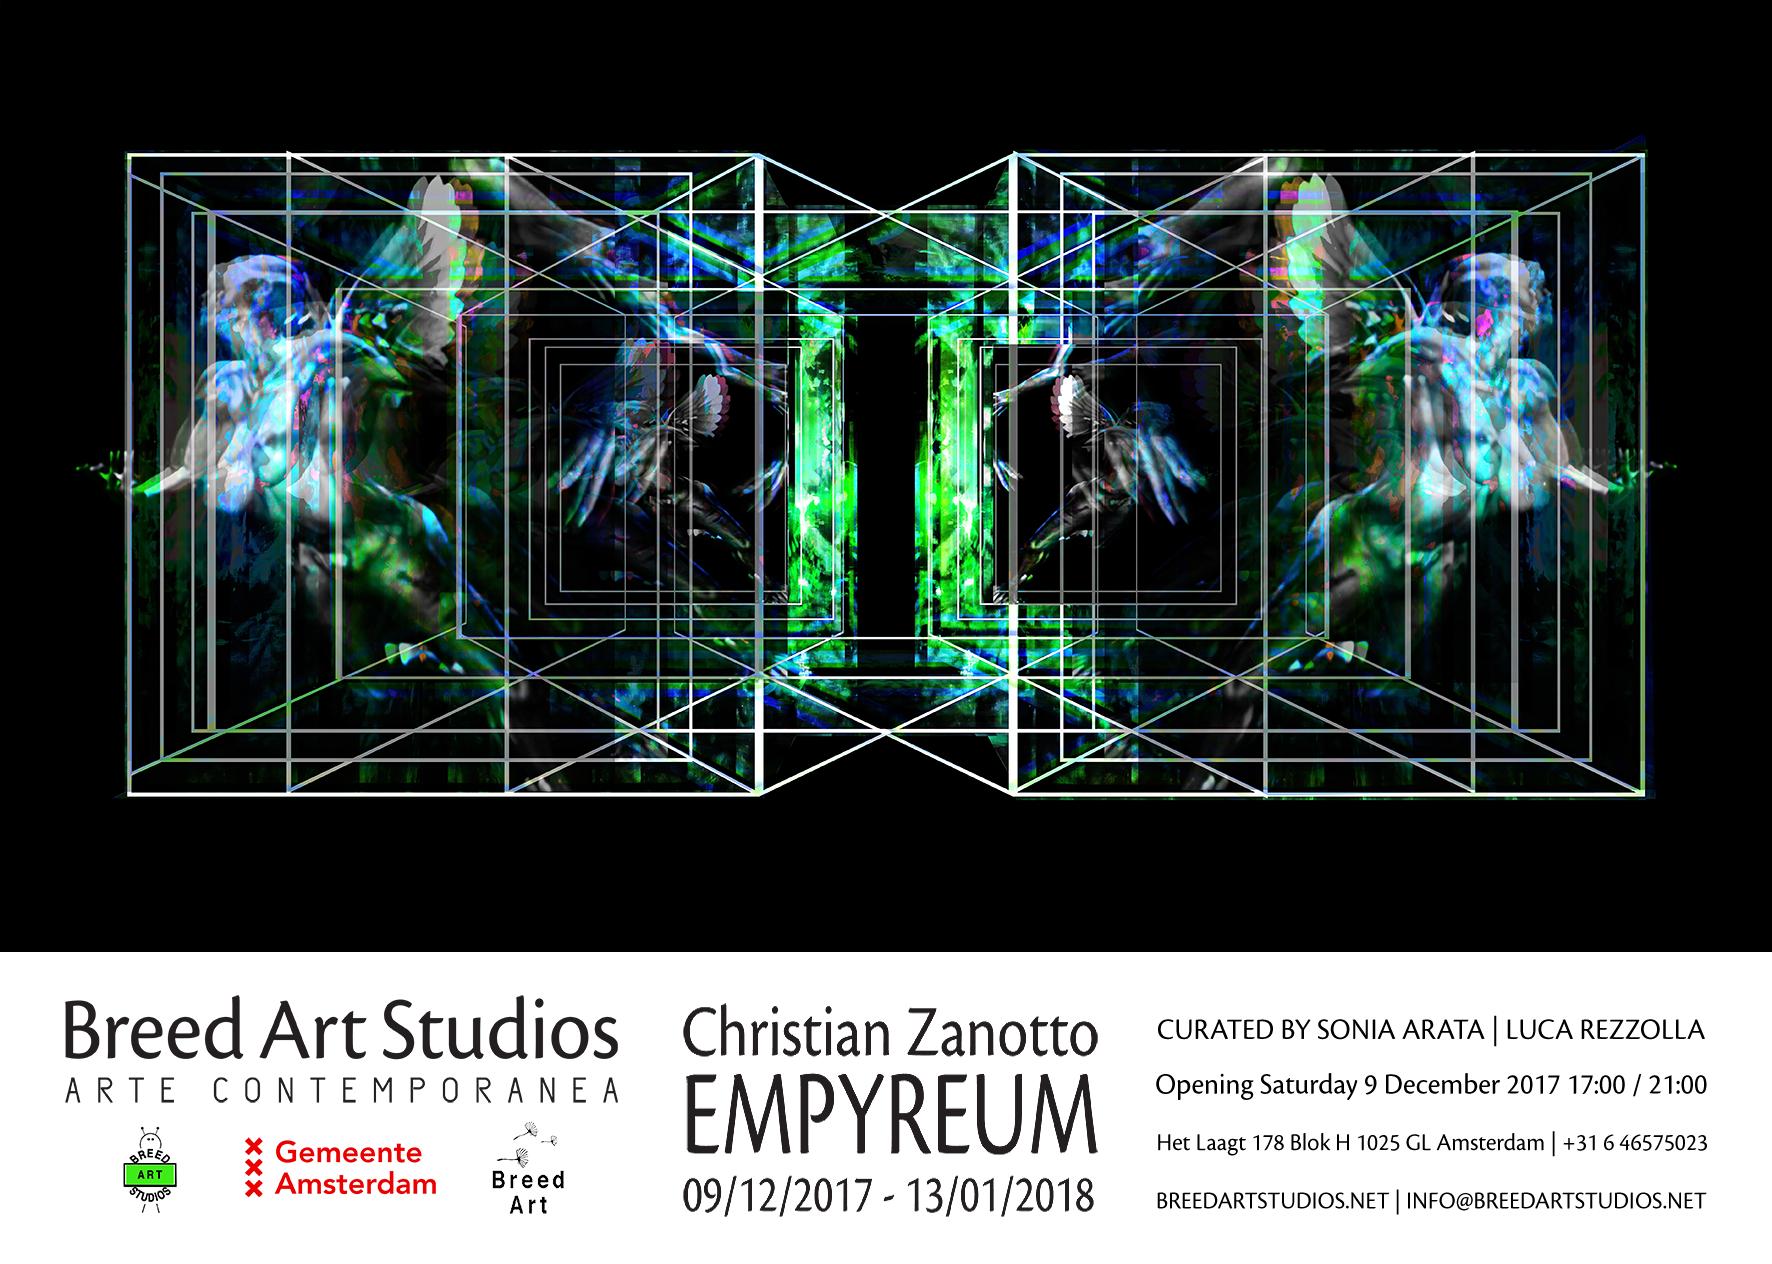 Tentoonstelling: Christian Zanotto 'EMPYREUM'